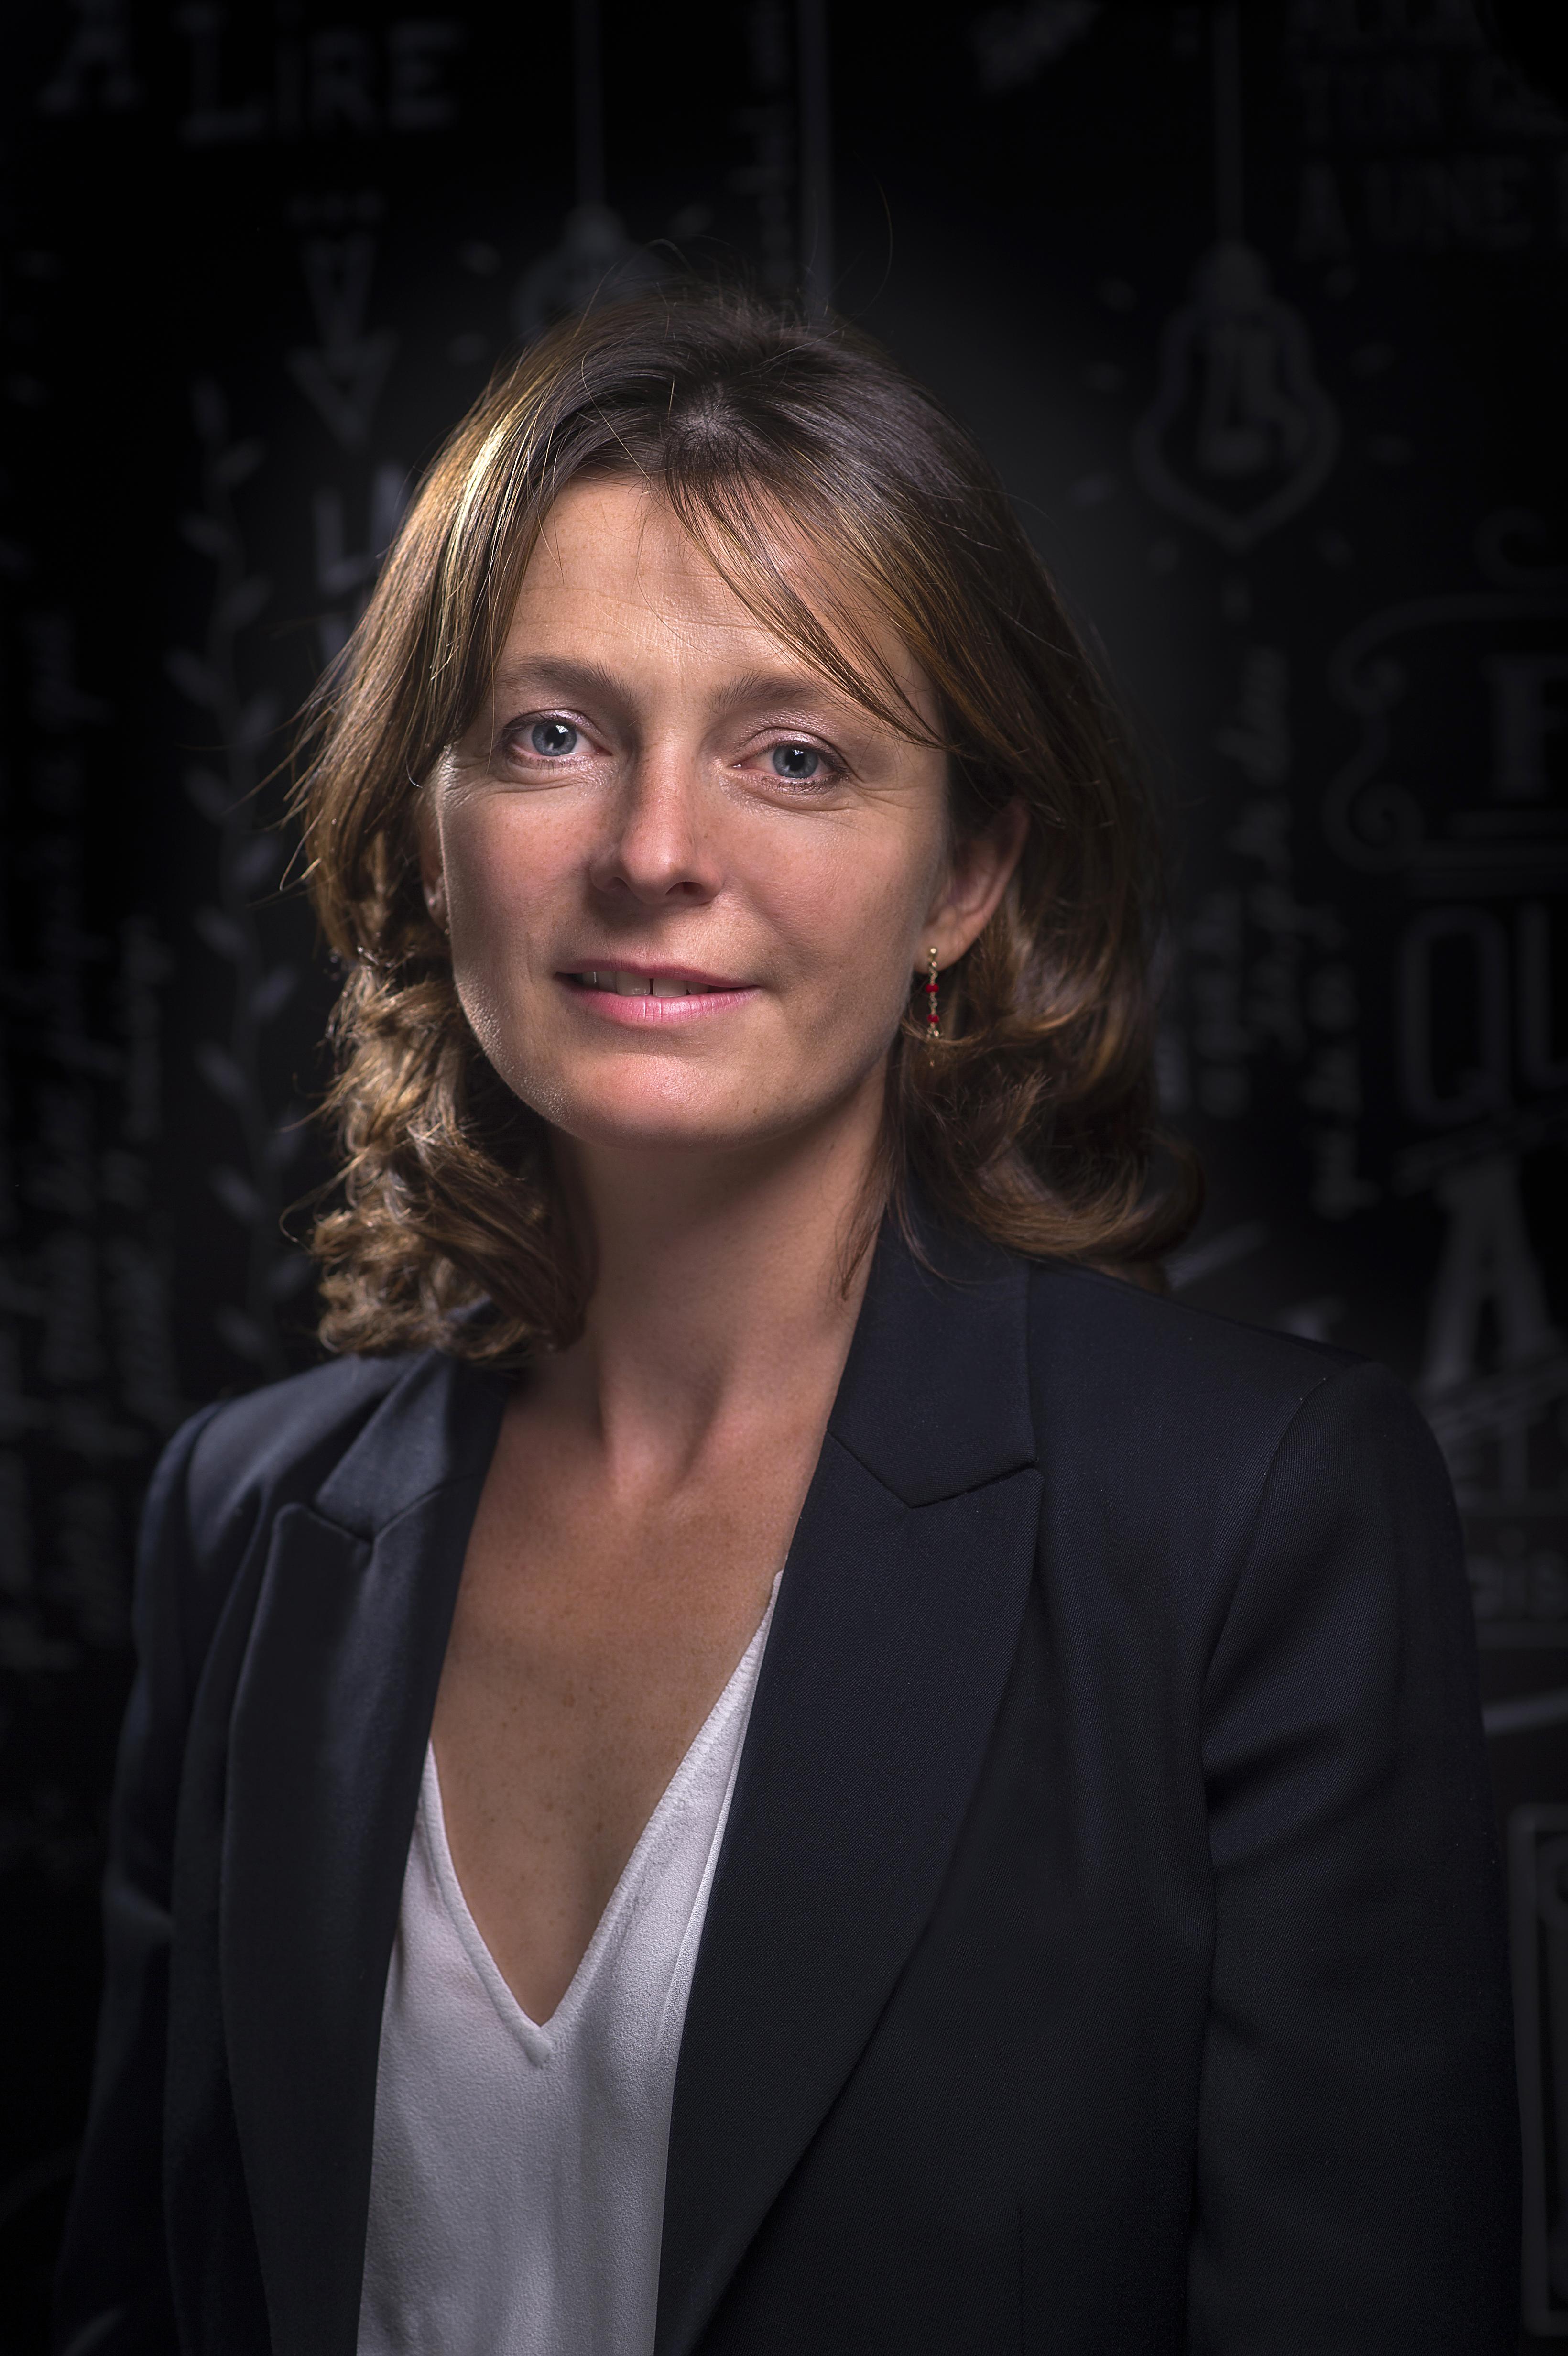 Emilie Bonnivard